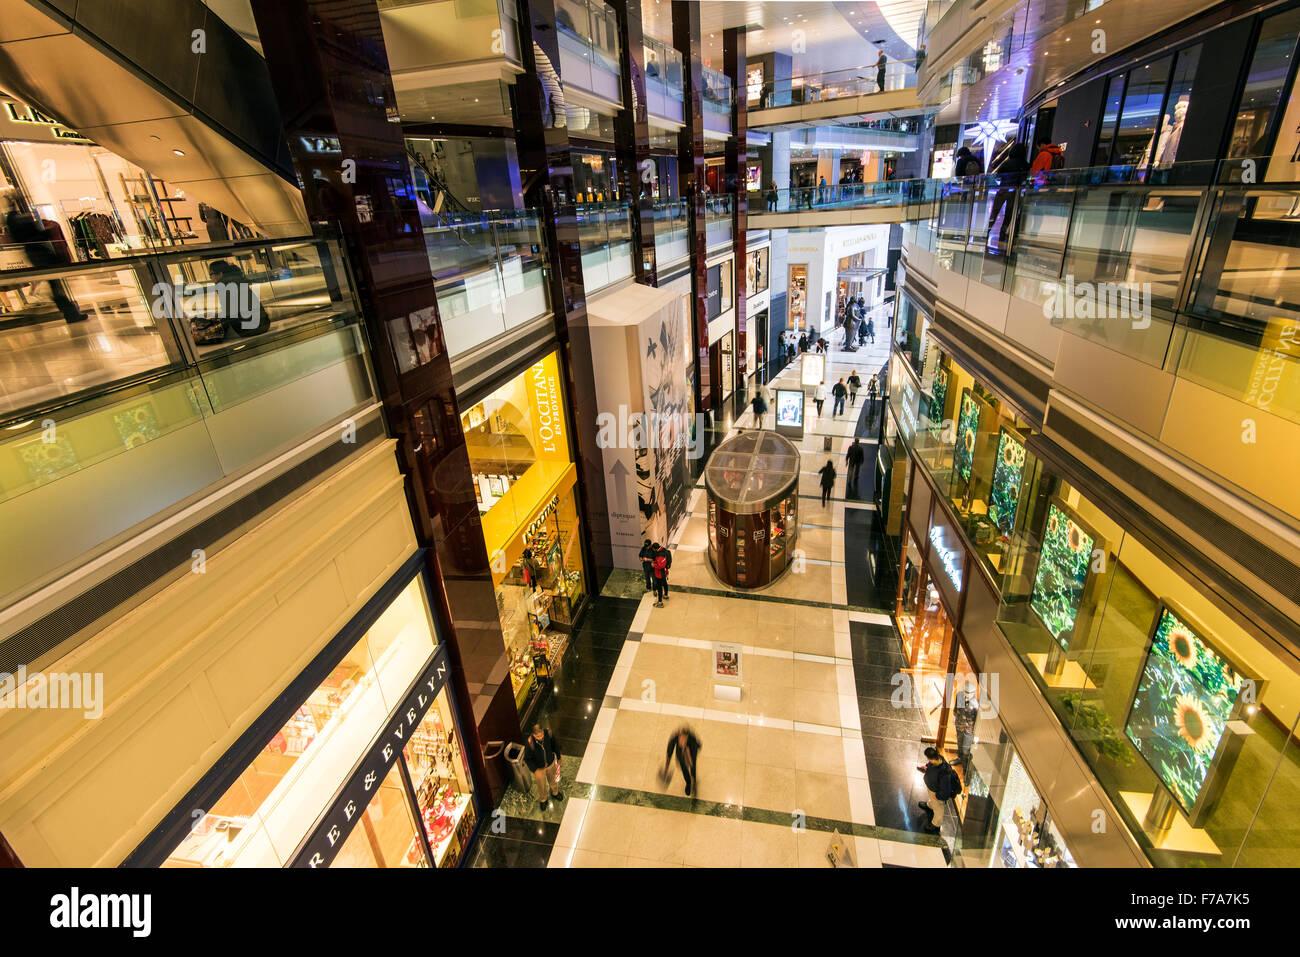 The Shops at Columbus Circle shopping mall, Time Warner Center, Manhattan, New York, USA - Stock Image